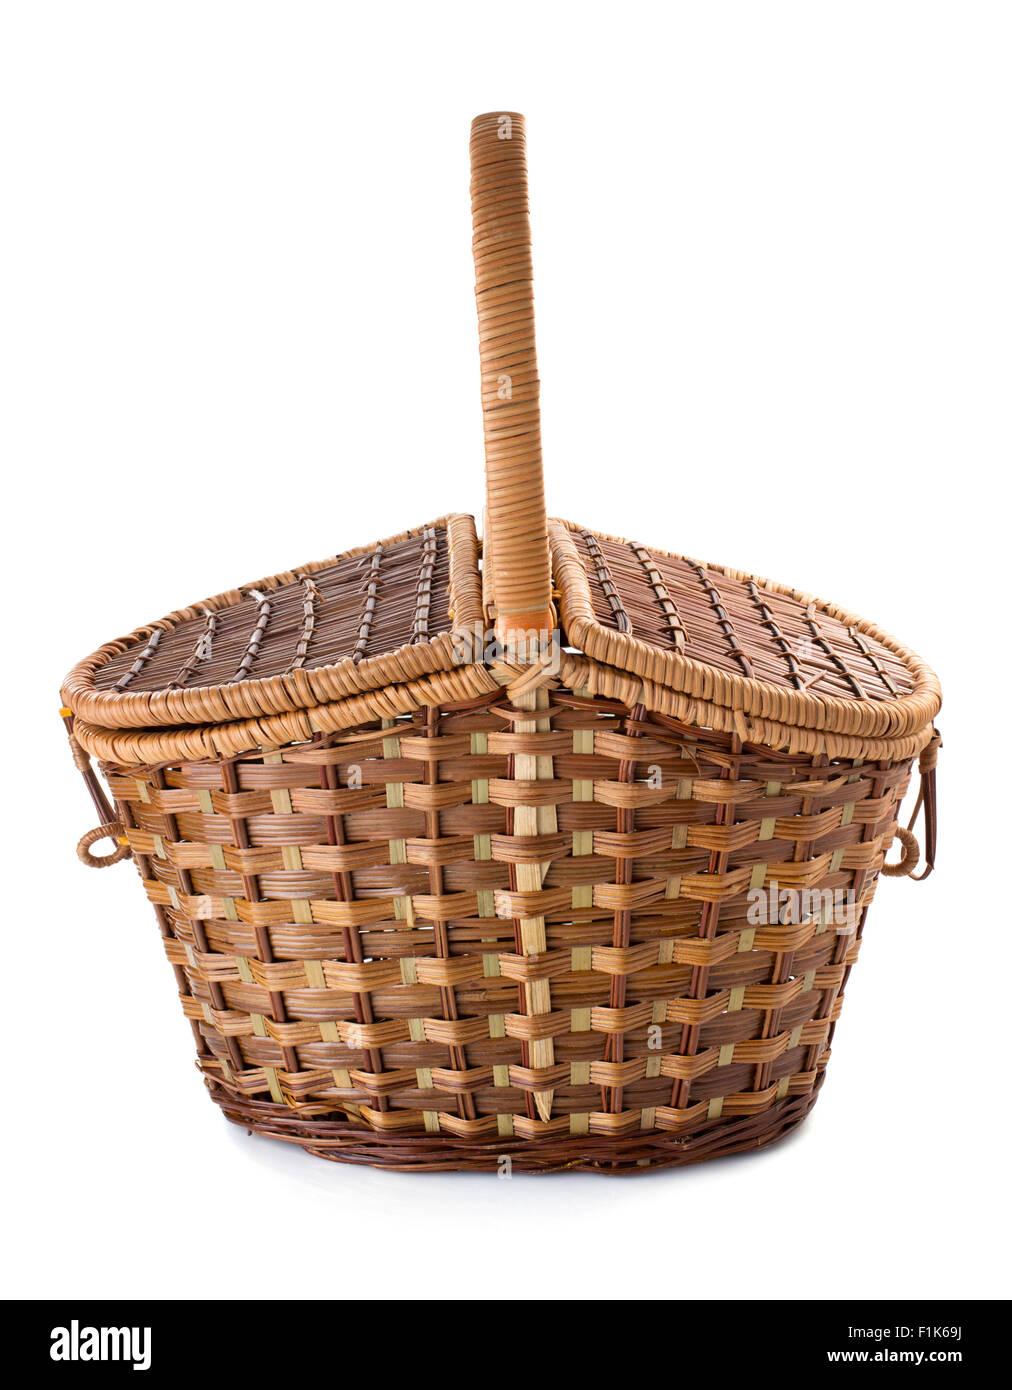 wicker basket isolated on white background - Stock Image